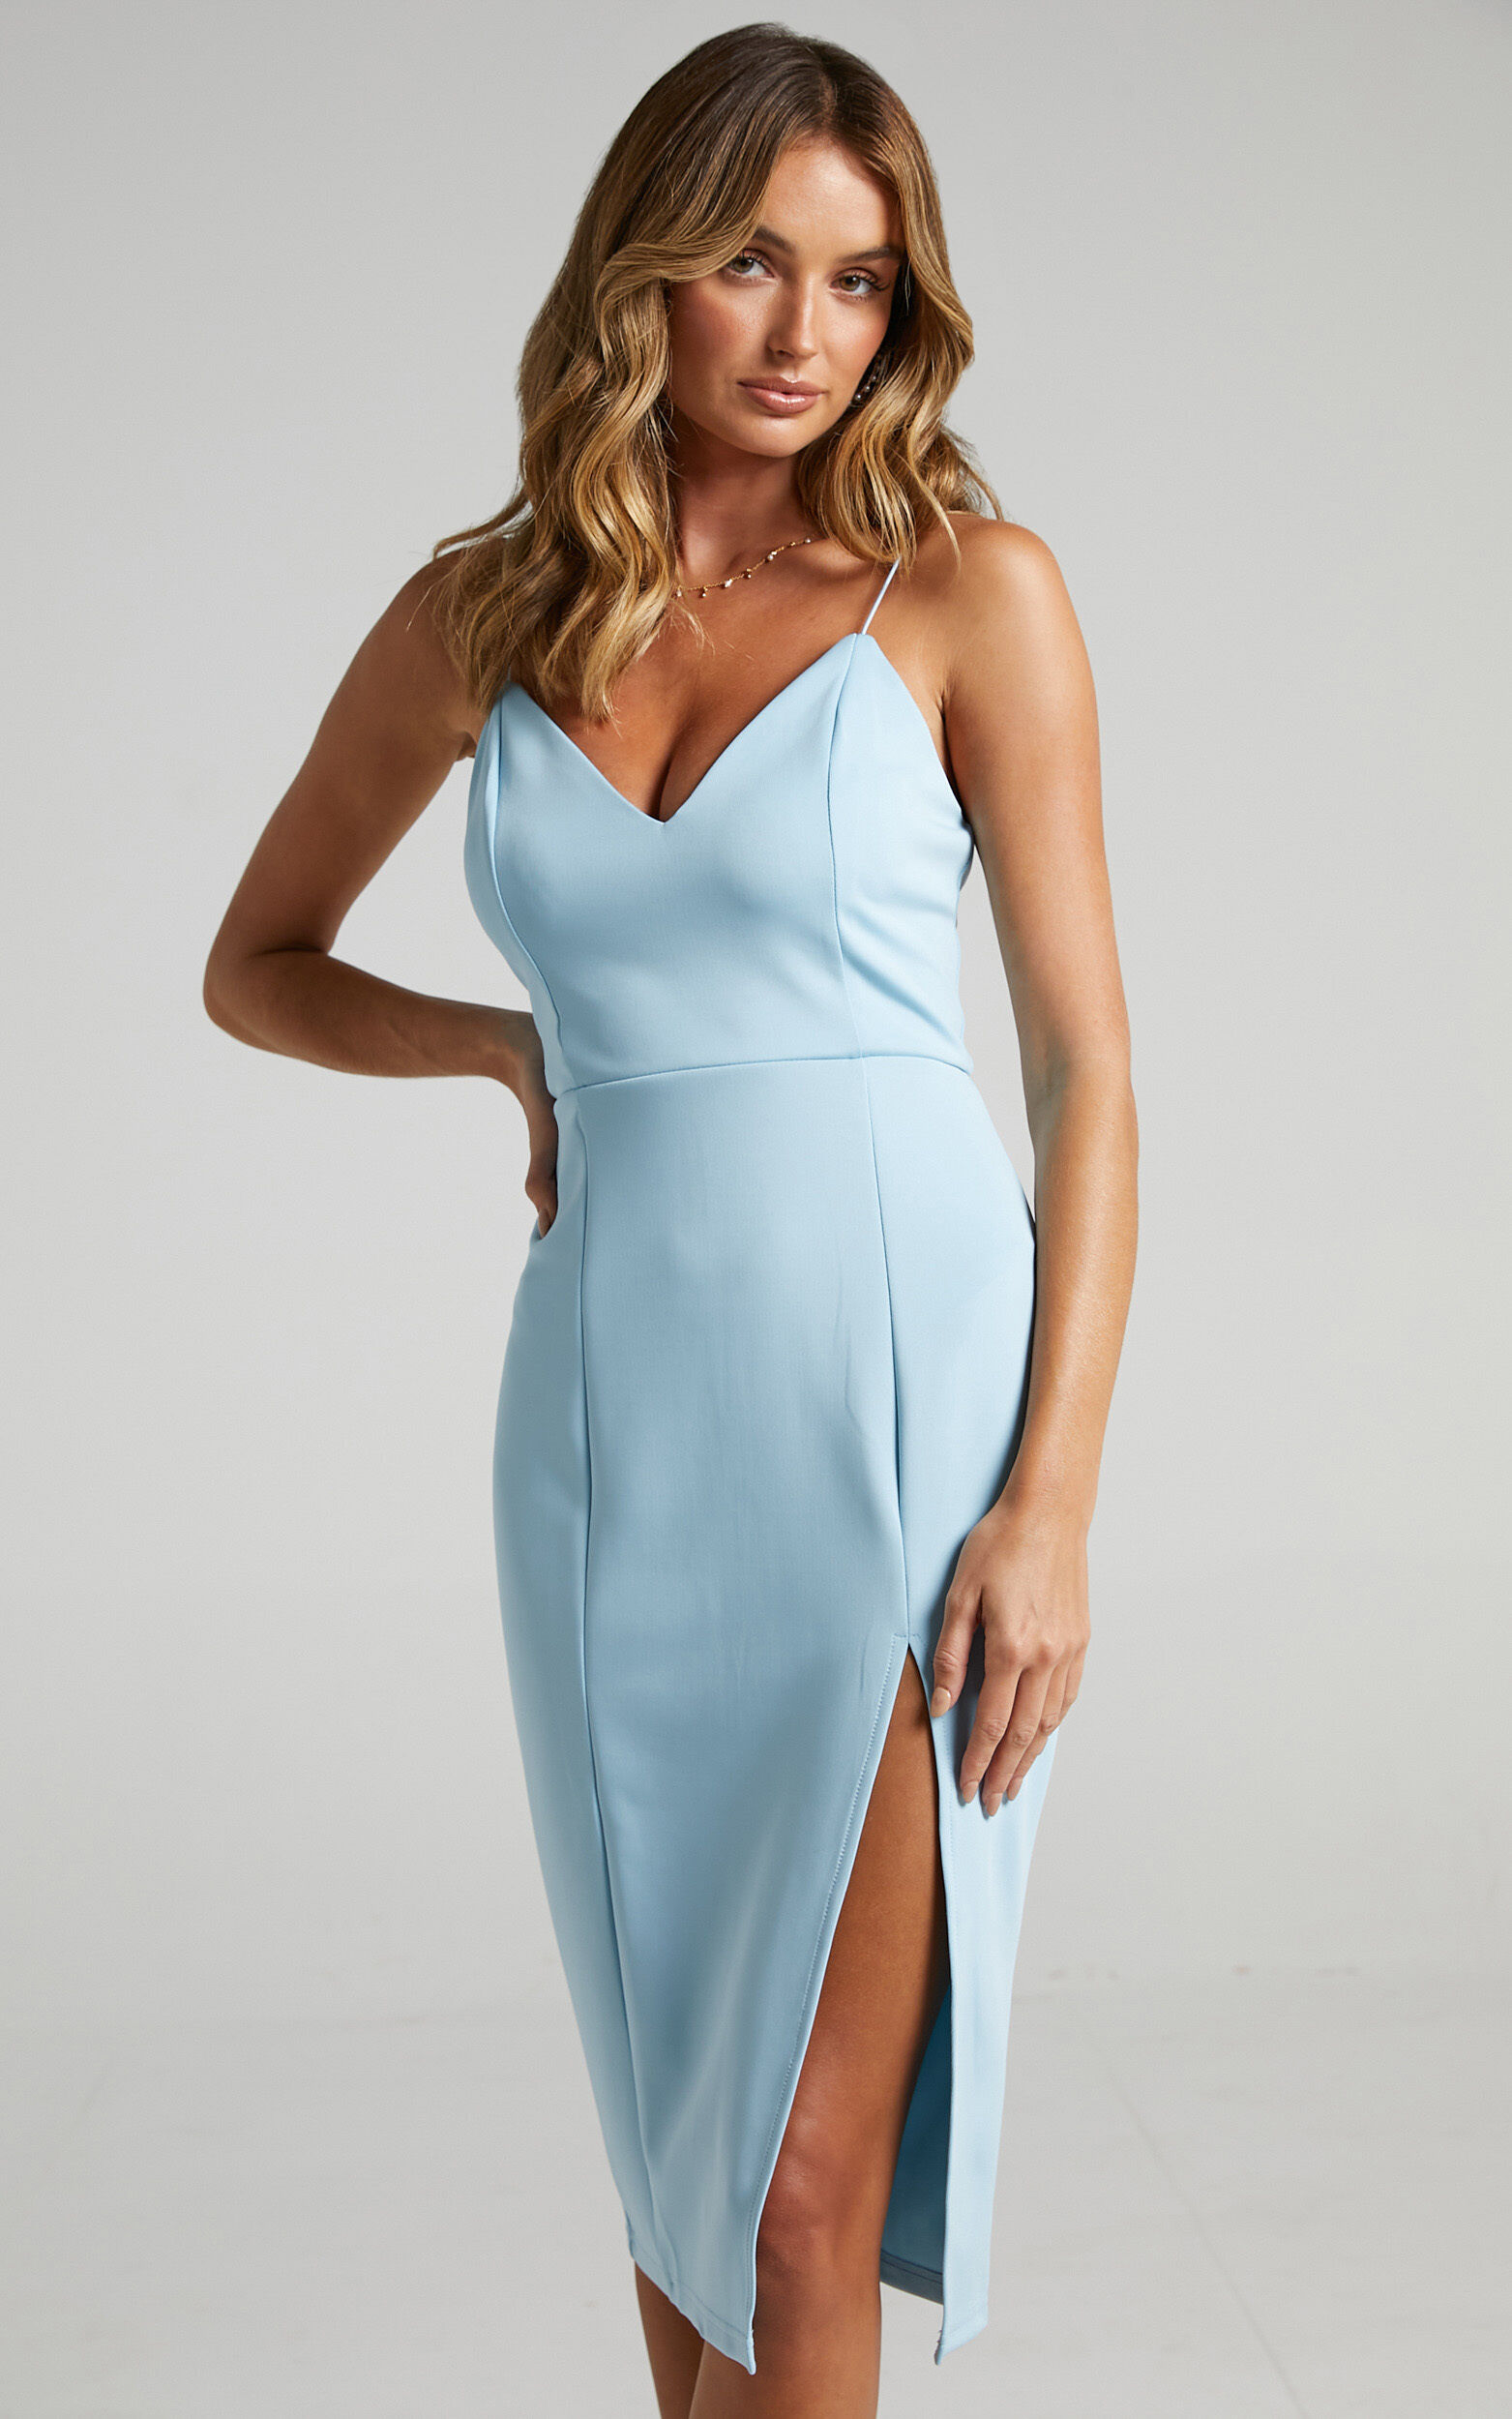 Big Ideas Midi Dress in Light Blue - 04, BLU2, super-hi-res image number null